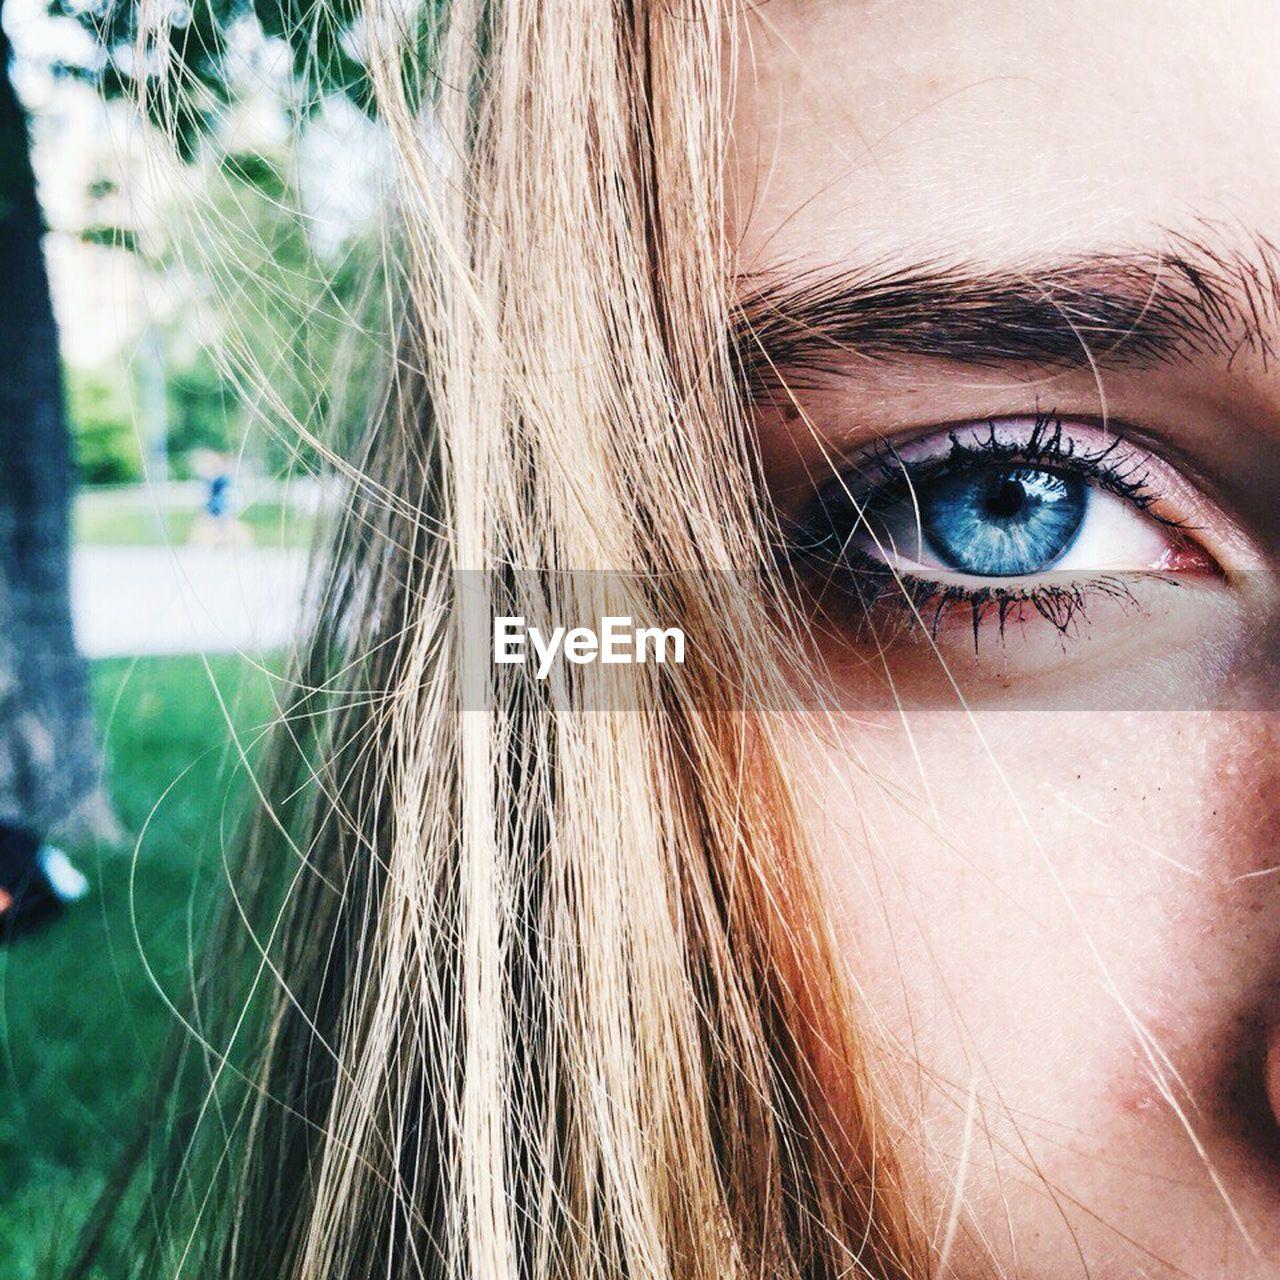 human eye, one person, human body part, close-up, eyesight, real people, eyeball, outdoors, day, iris - eye, eyelash, blond hair, people